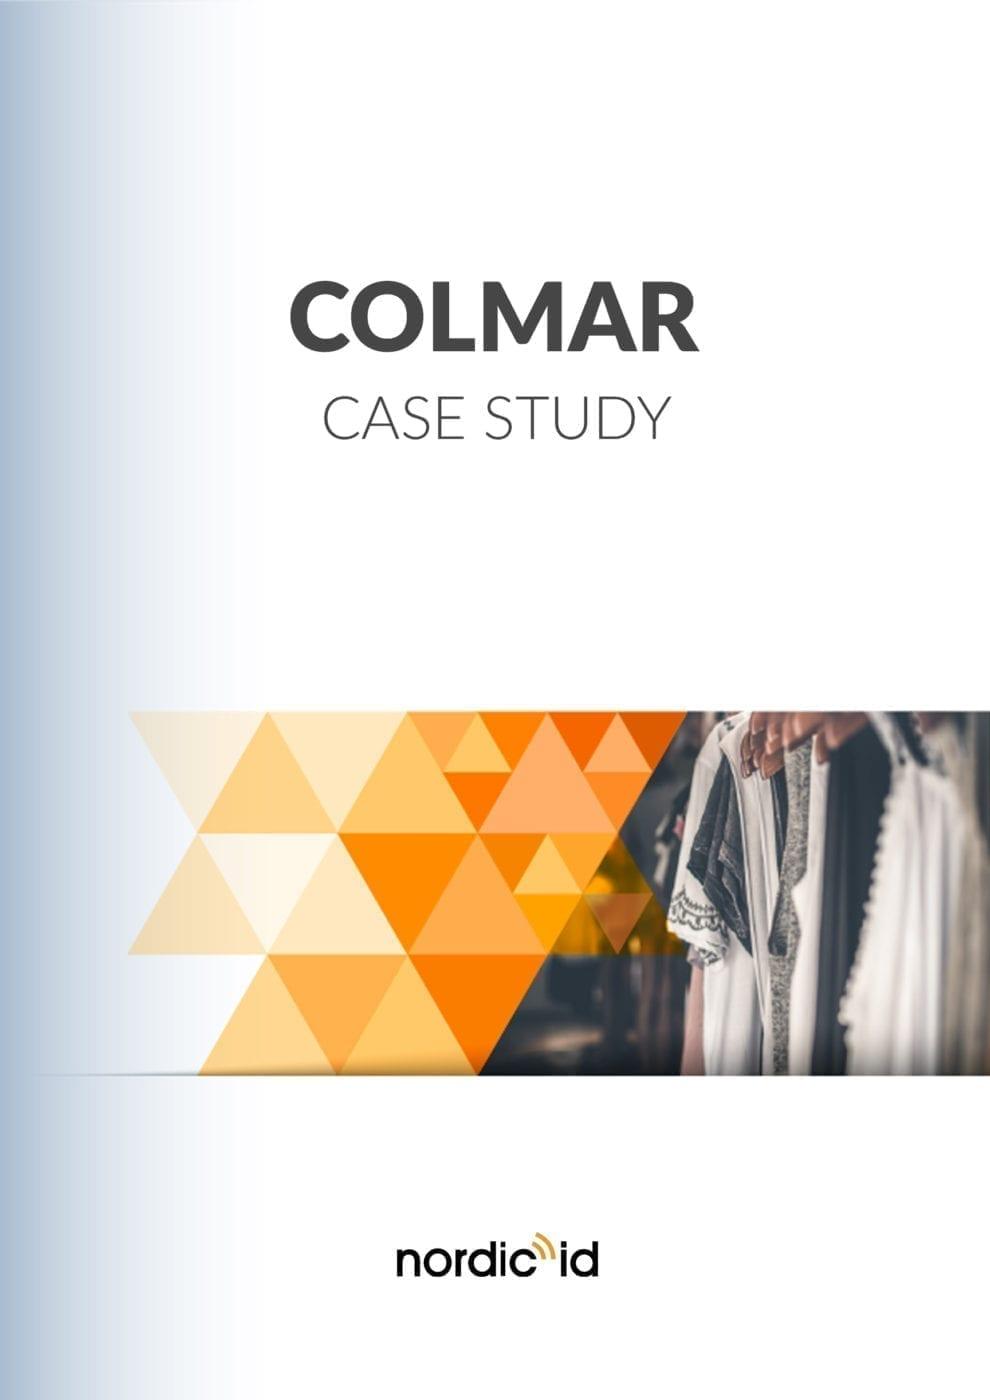 colmar care study